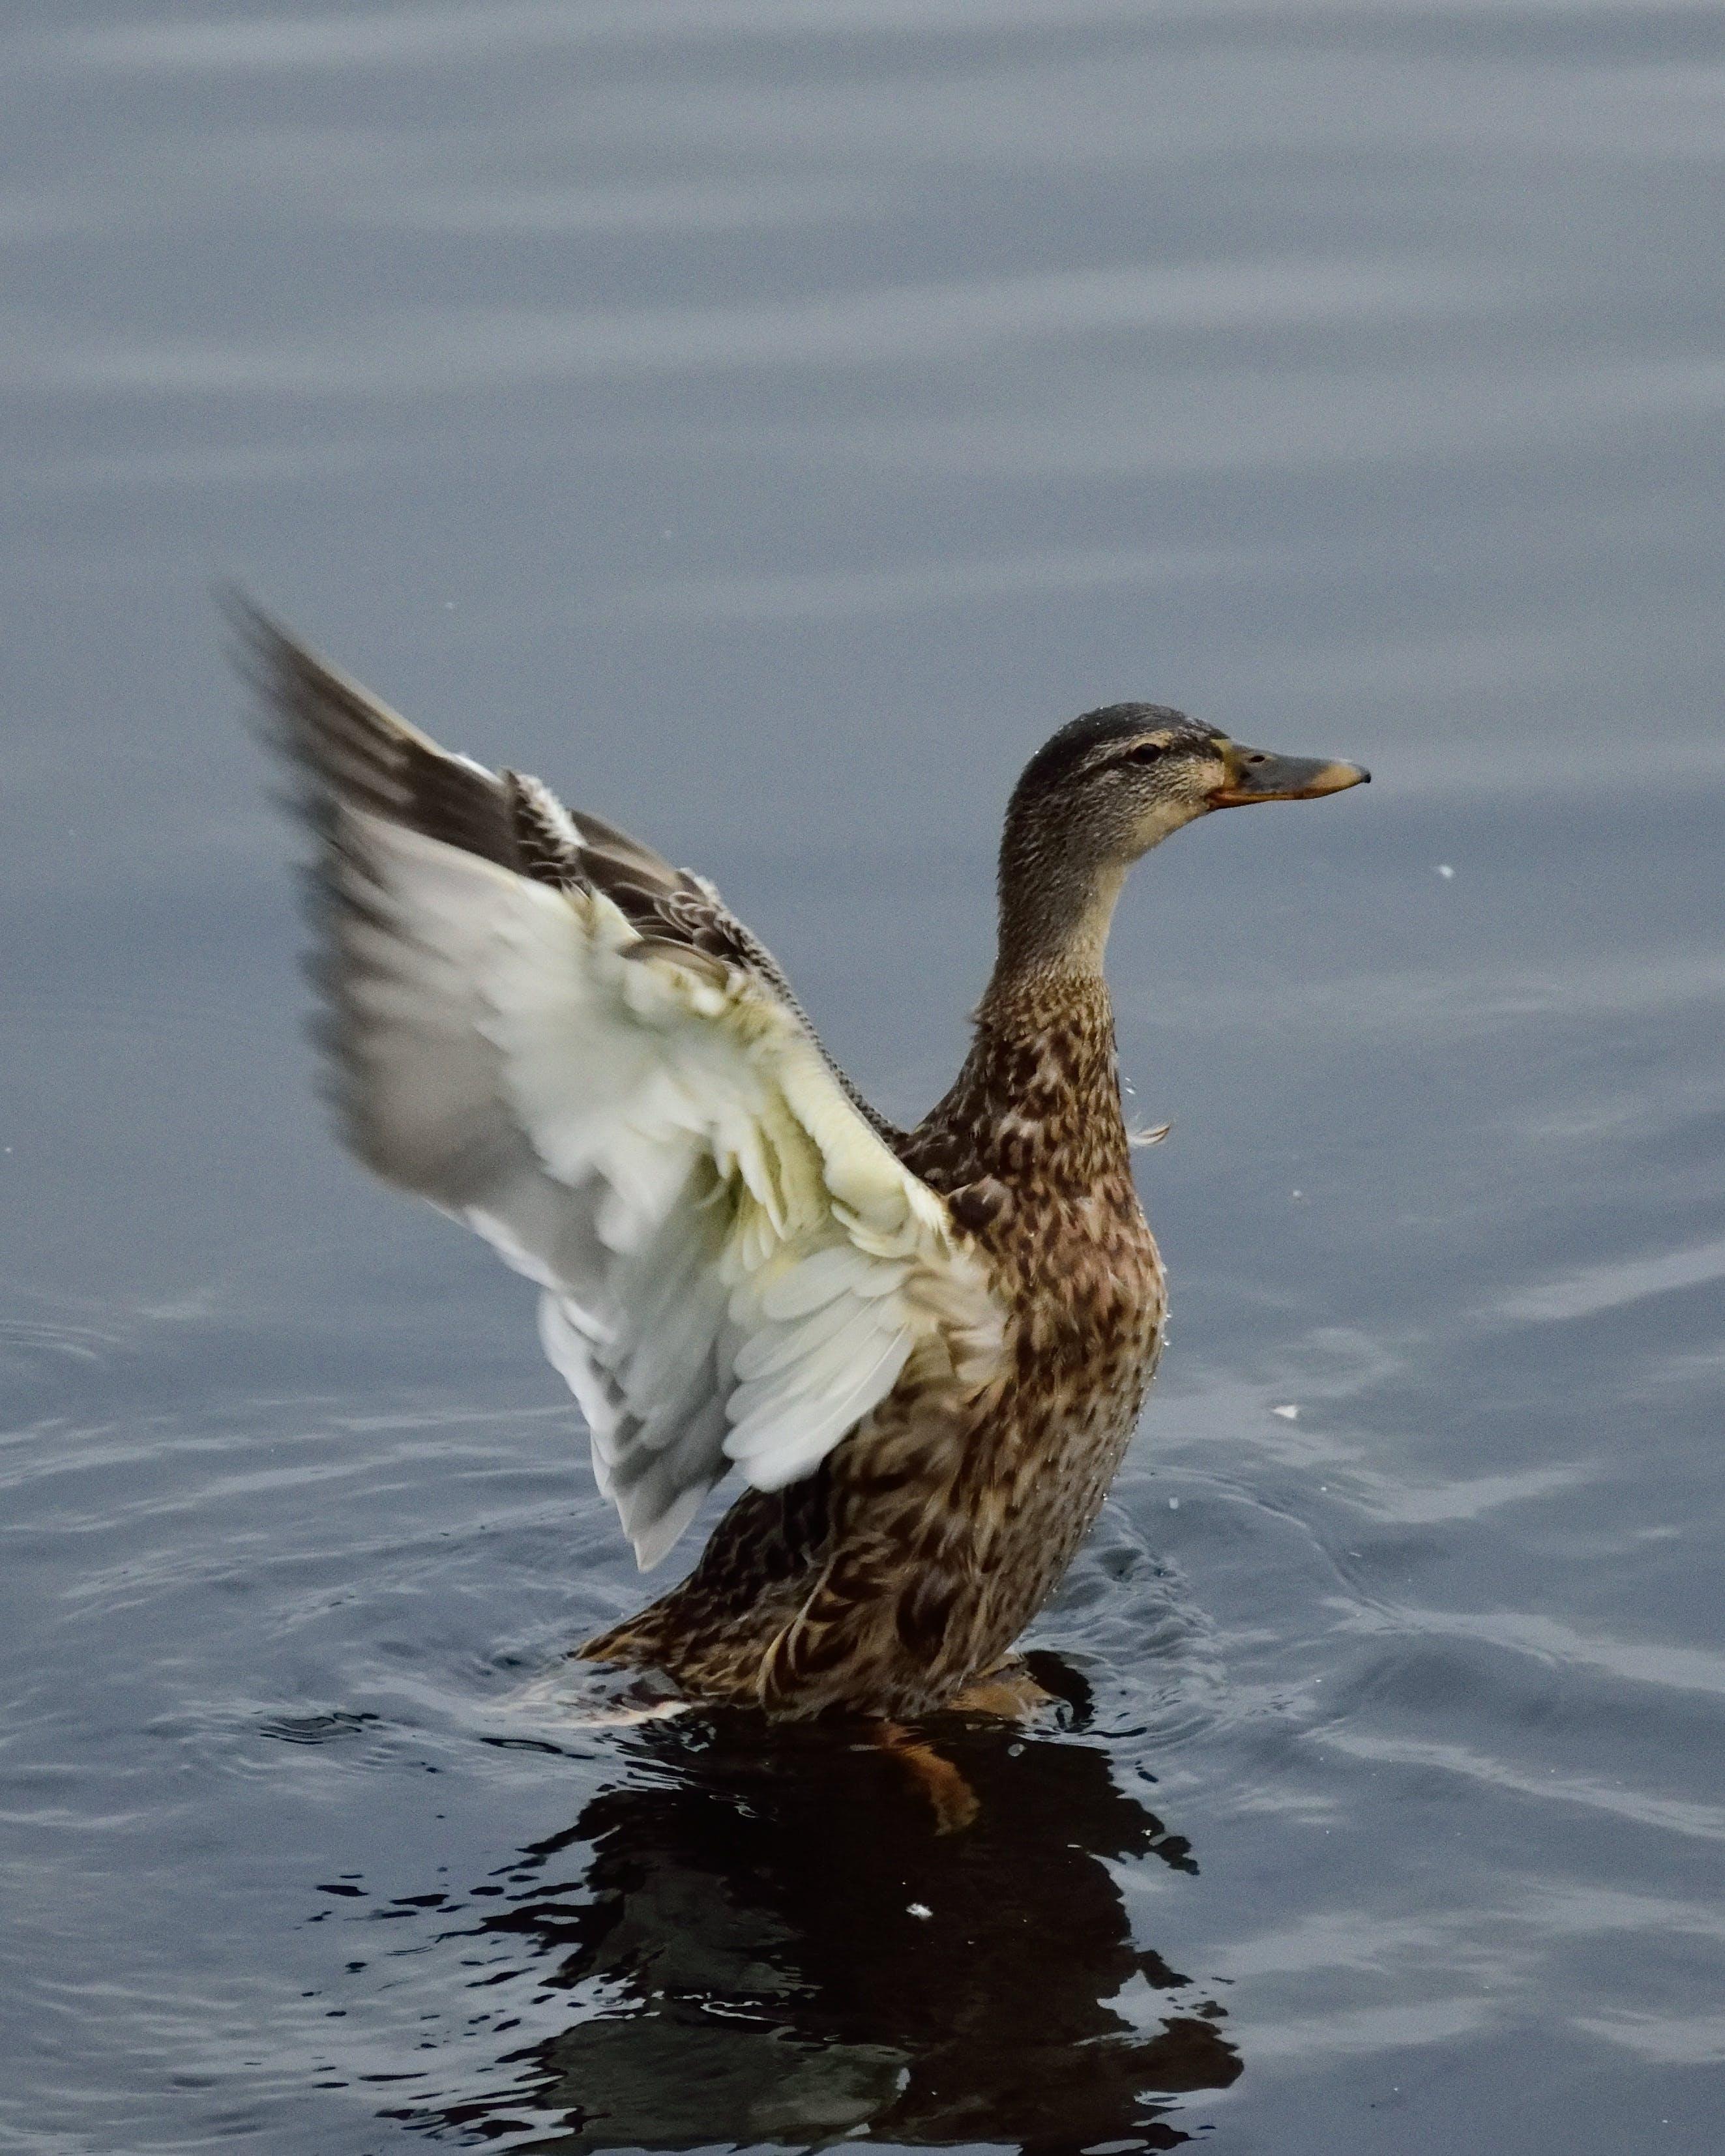 Free stock photo of nature, bird, water, lake